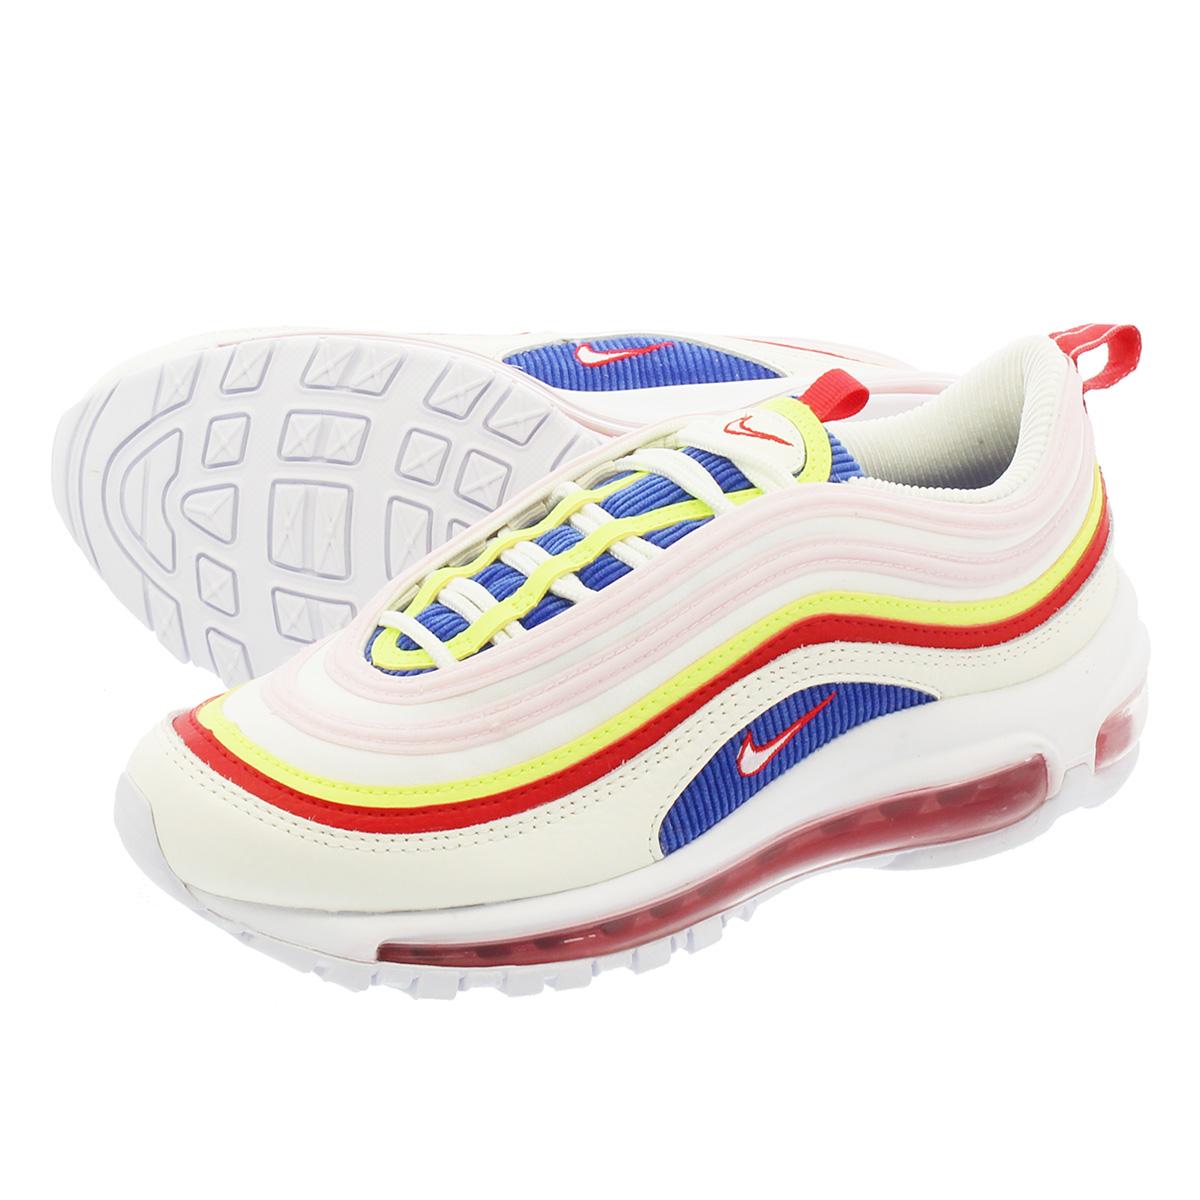 NIKE WMNS AIR MAX 97 SE Nike women Air Max 97 SE SAILARCTIC PINKVOLT GLOW aq4137 101